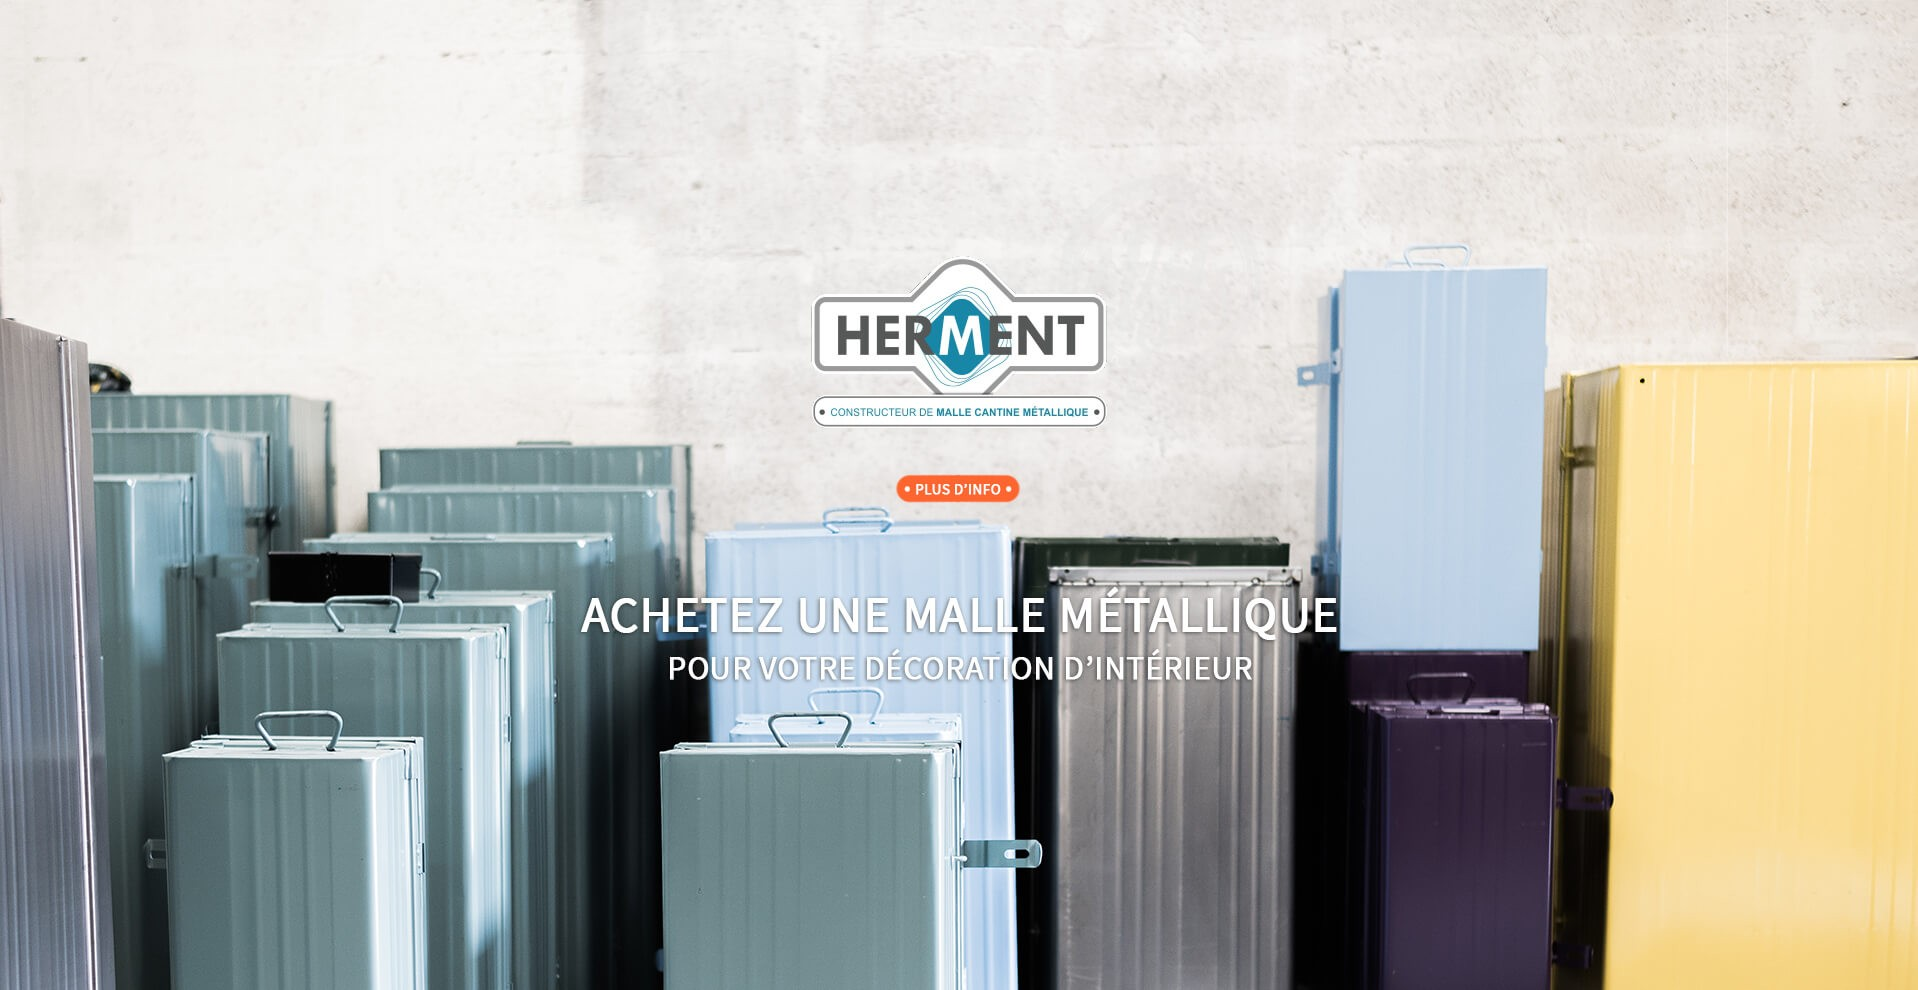 établissements herment, fabricant de malles métalliques sur mesure